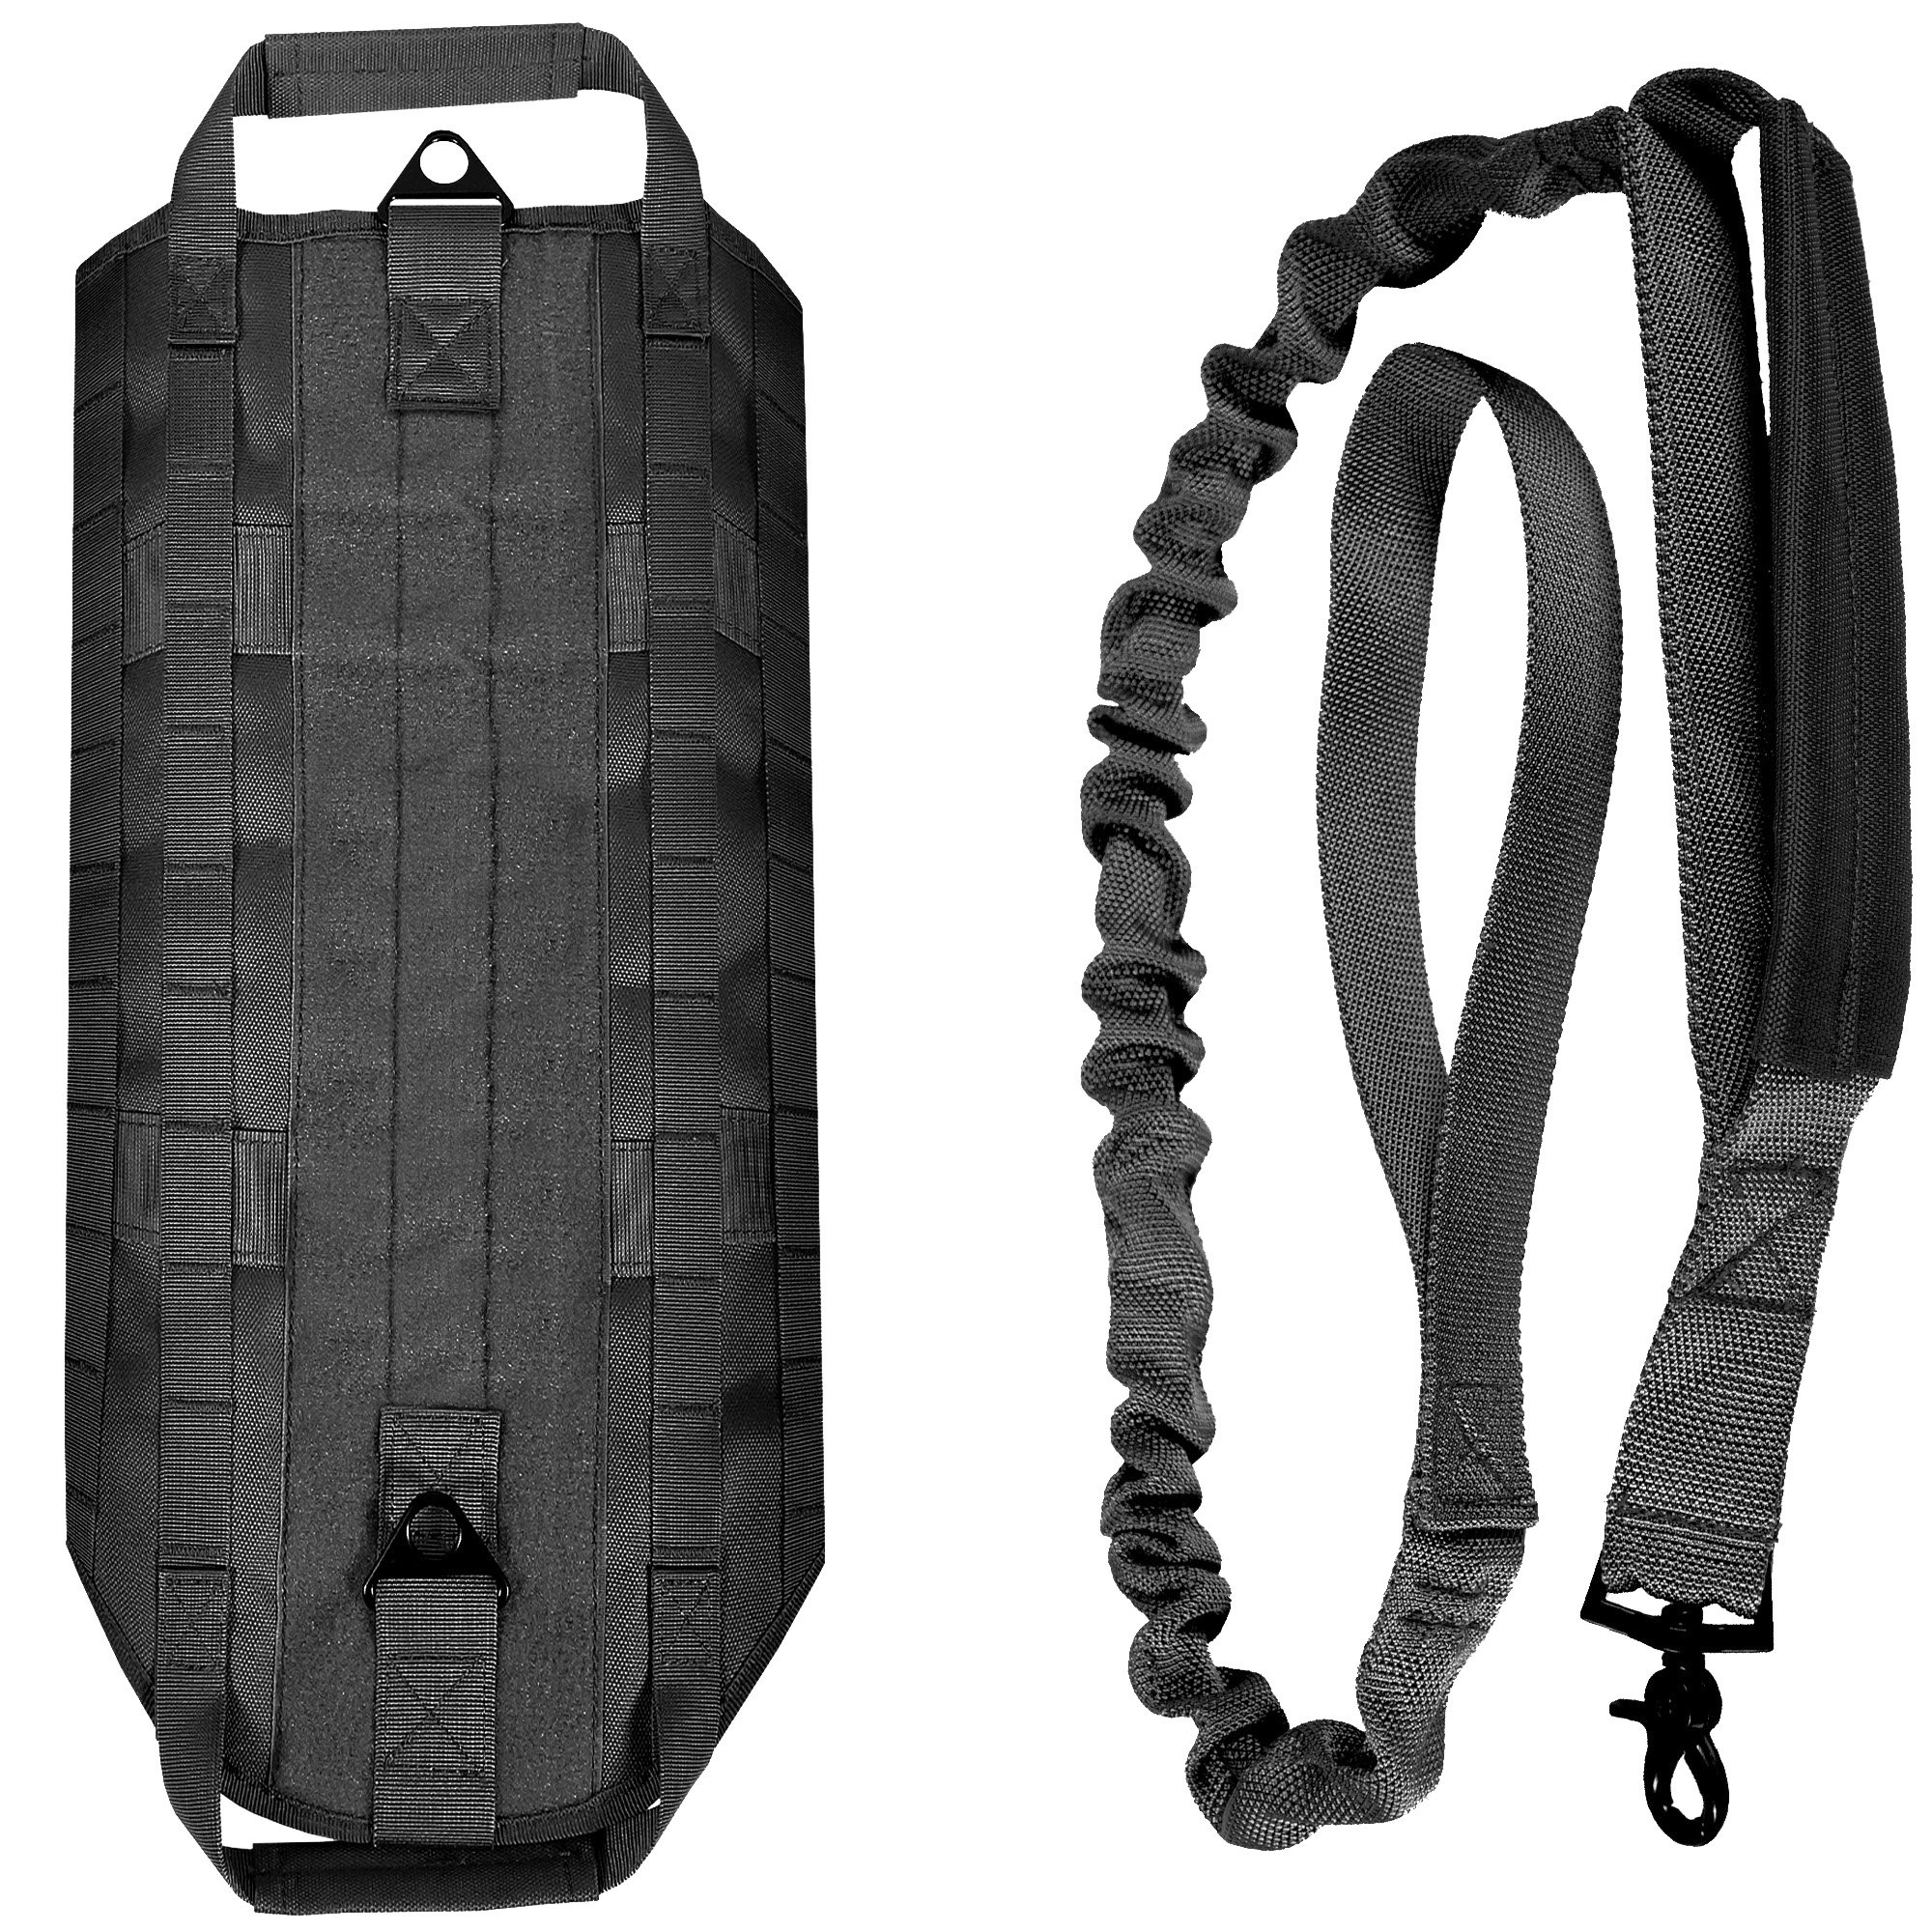 LIVABIT [ Black Canine Service Dog Tactical Molle Vest Harness + Matching Heavy Duty Bungee Leash Strap Medium